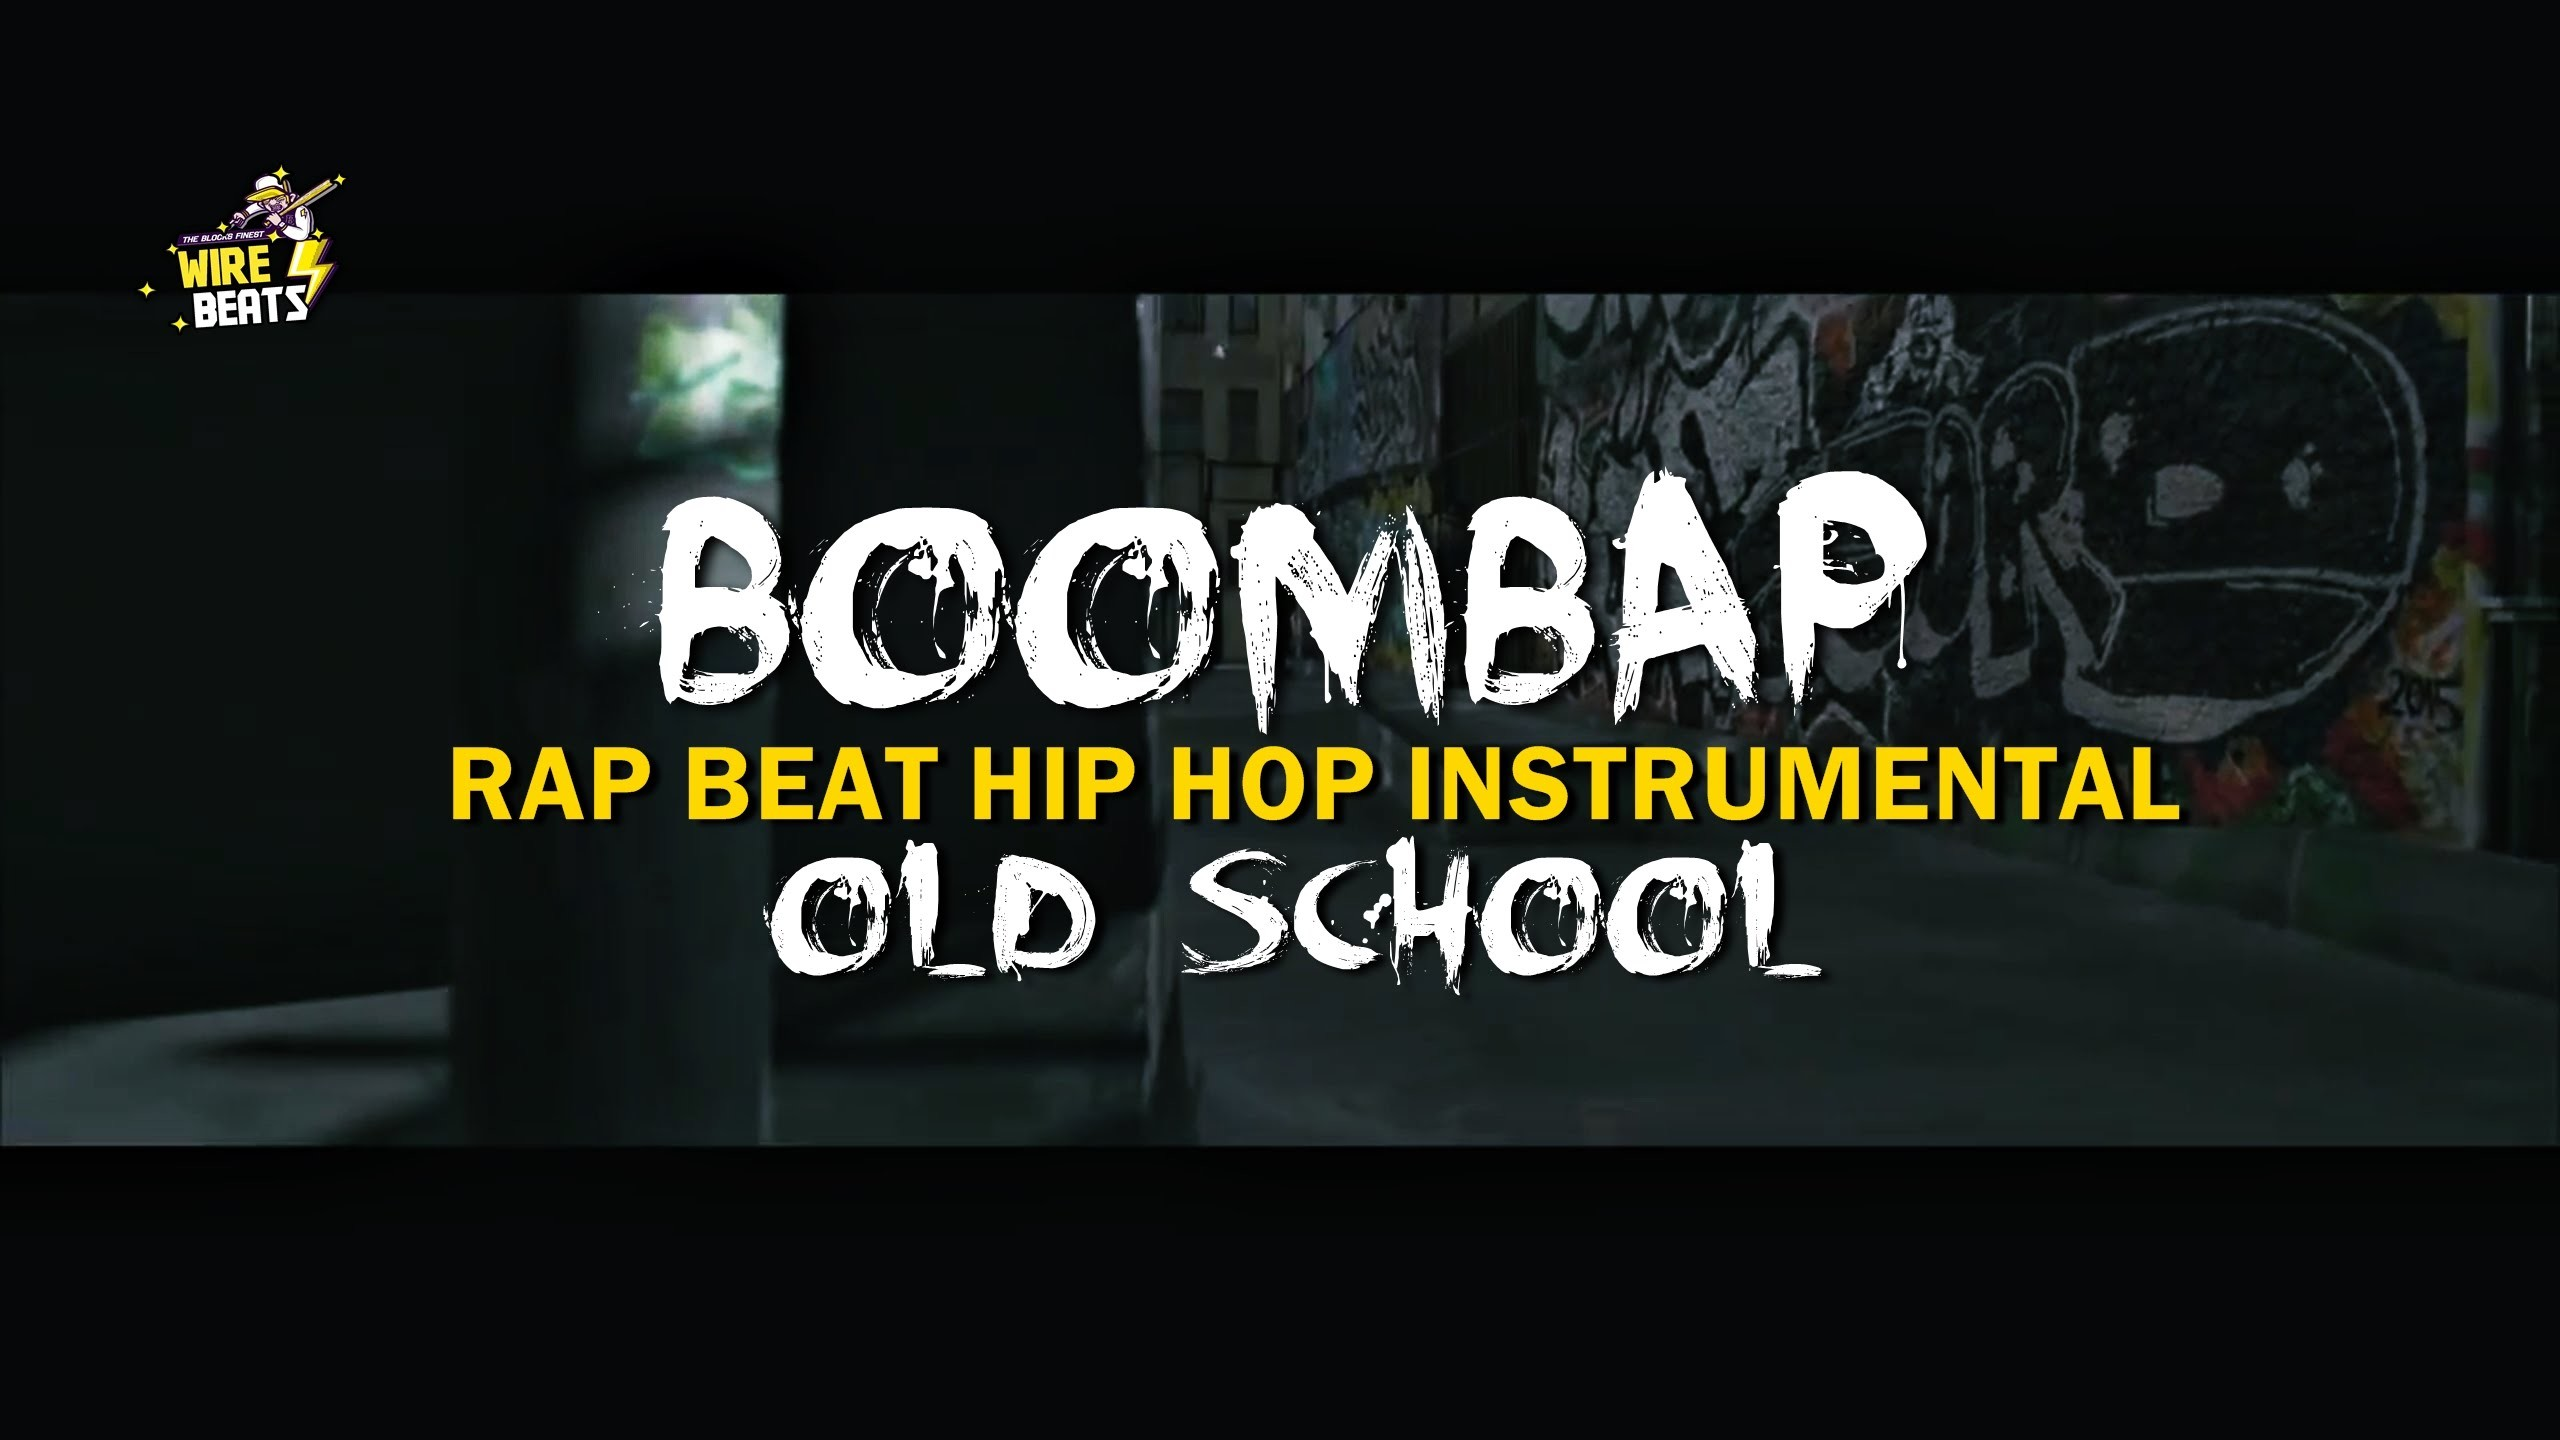 Real Old School Rap Beat │BoomBap Hip Hop Instrumental │Wirebeats The  Blocks Finest Instrumentals – YouTube